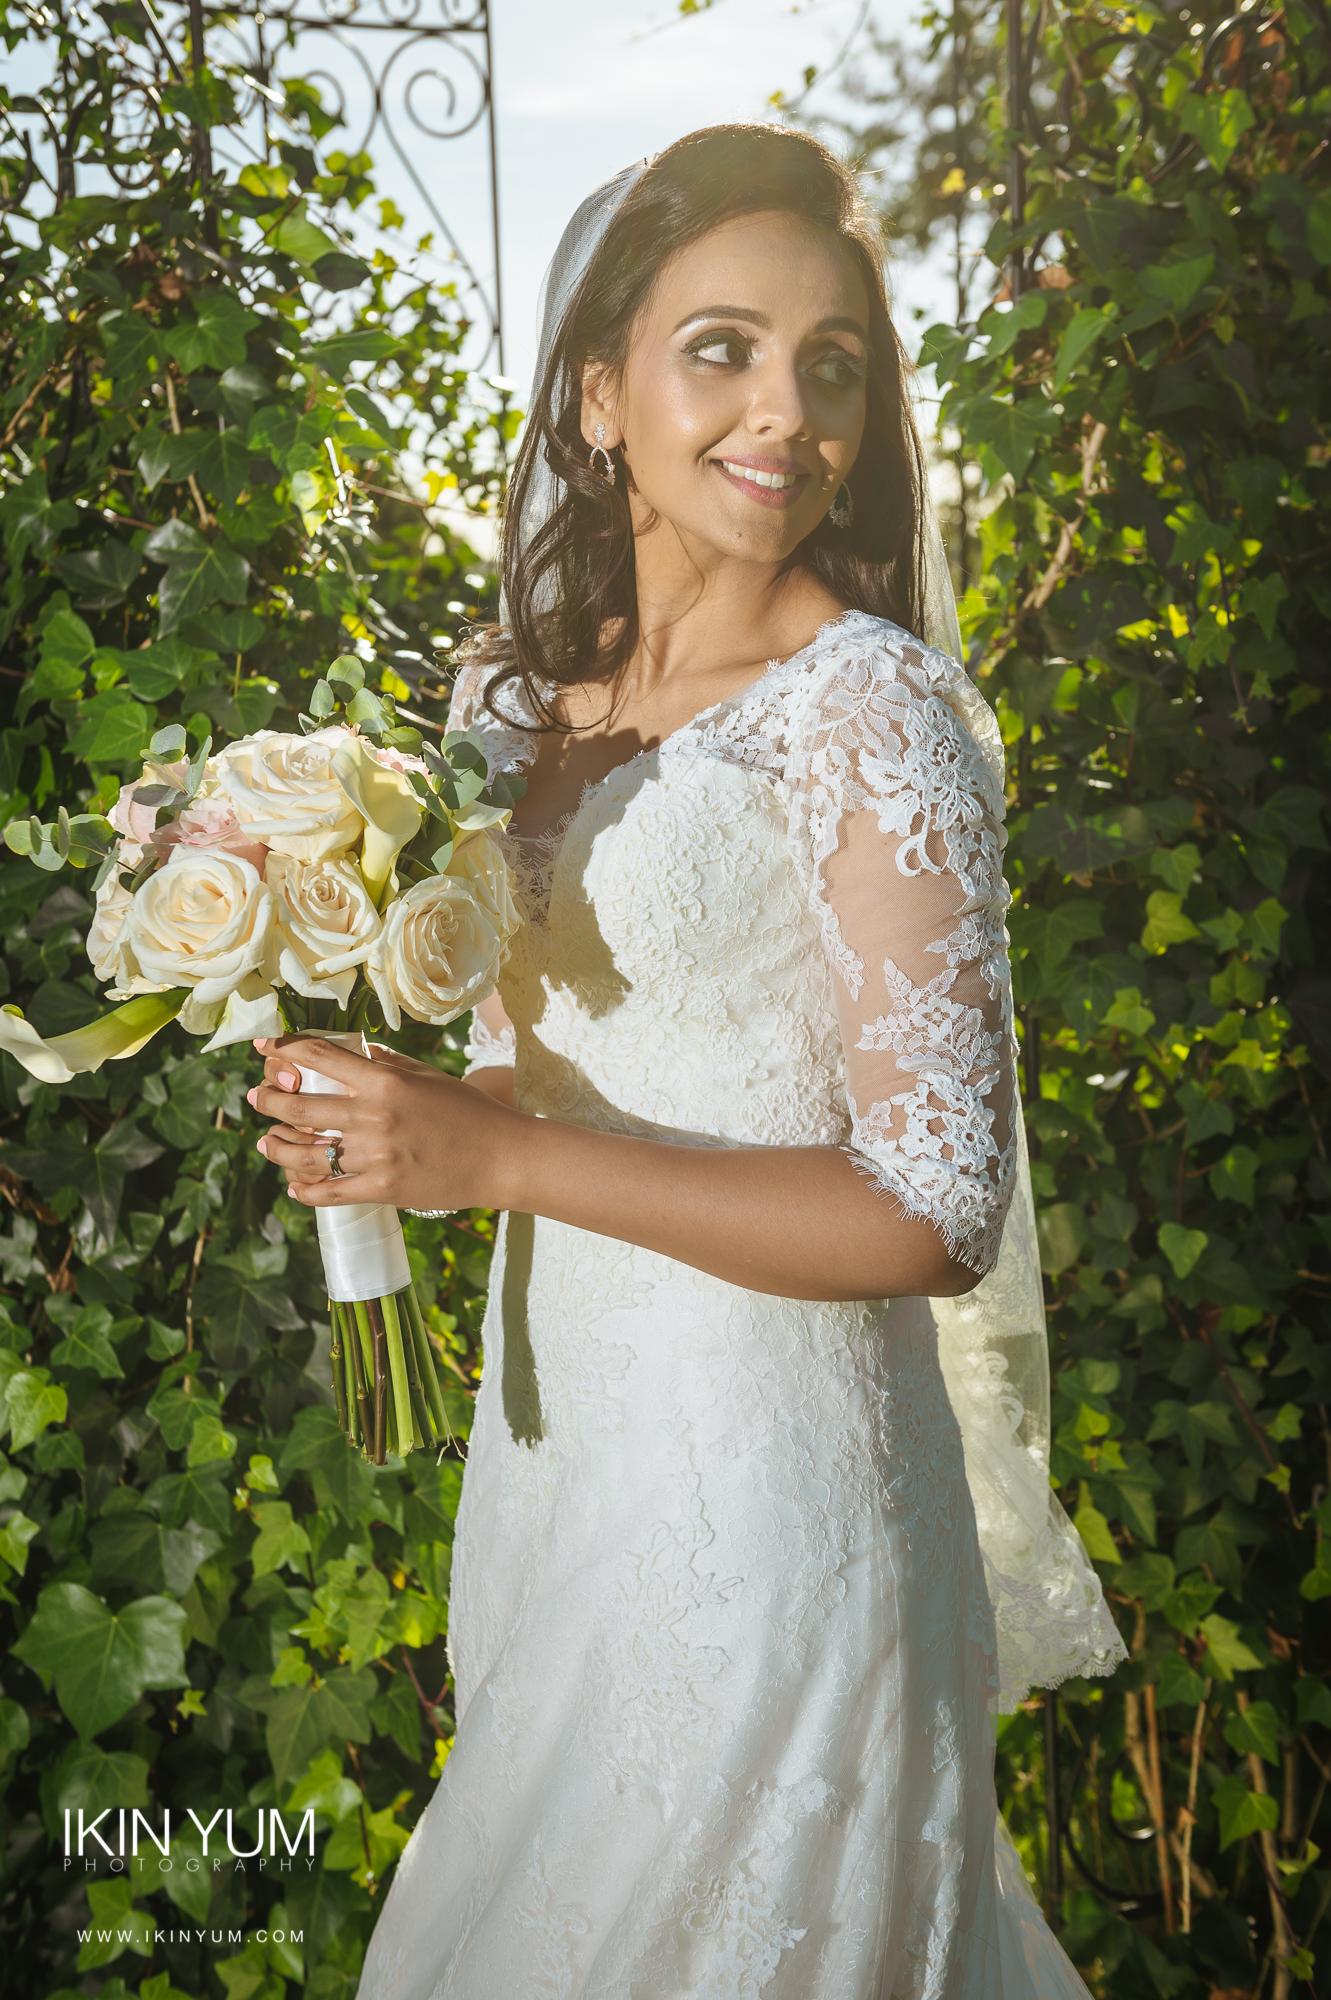 Laura Ashley Manor Wedding - Ikin Yum Photography-105.jpg